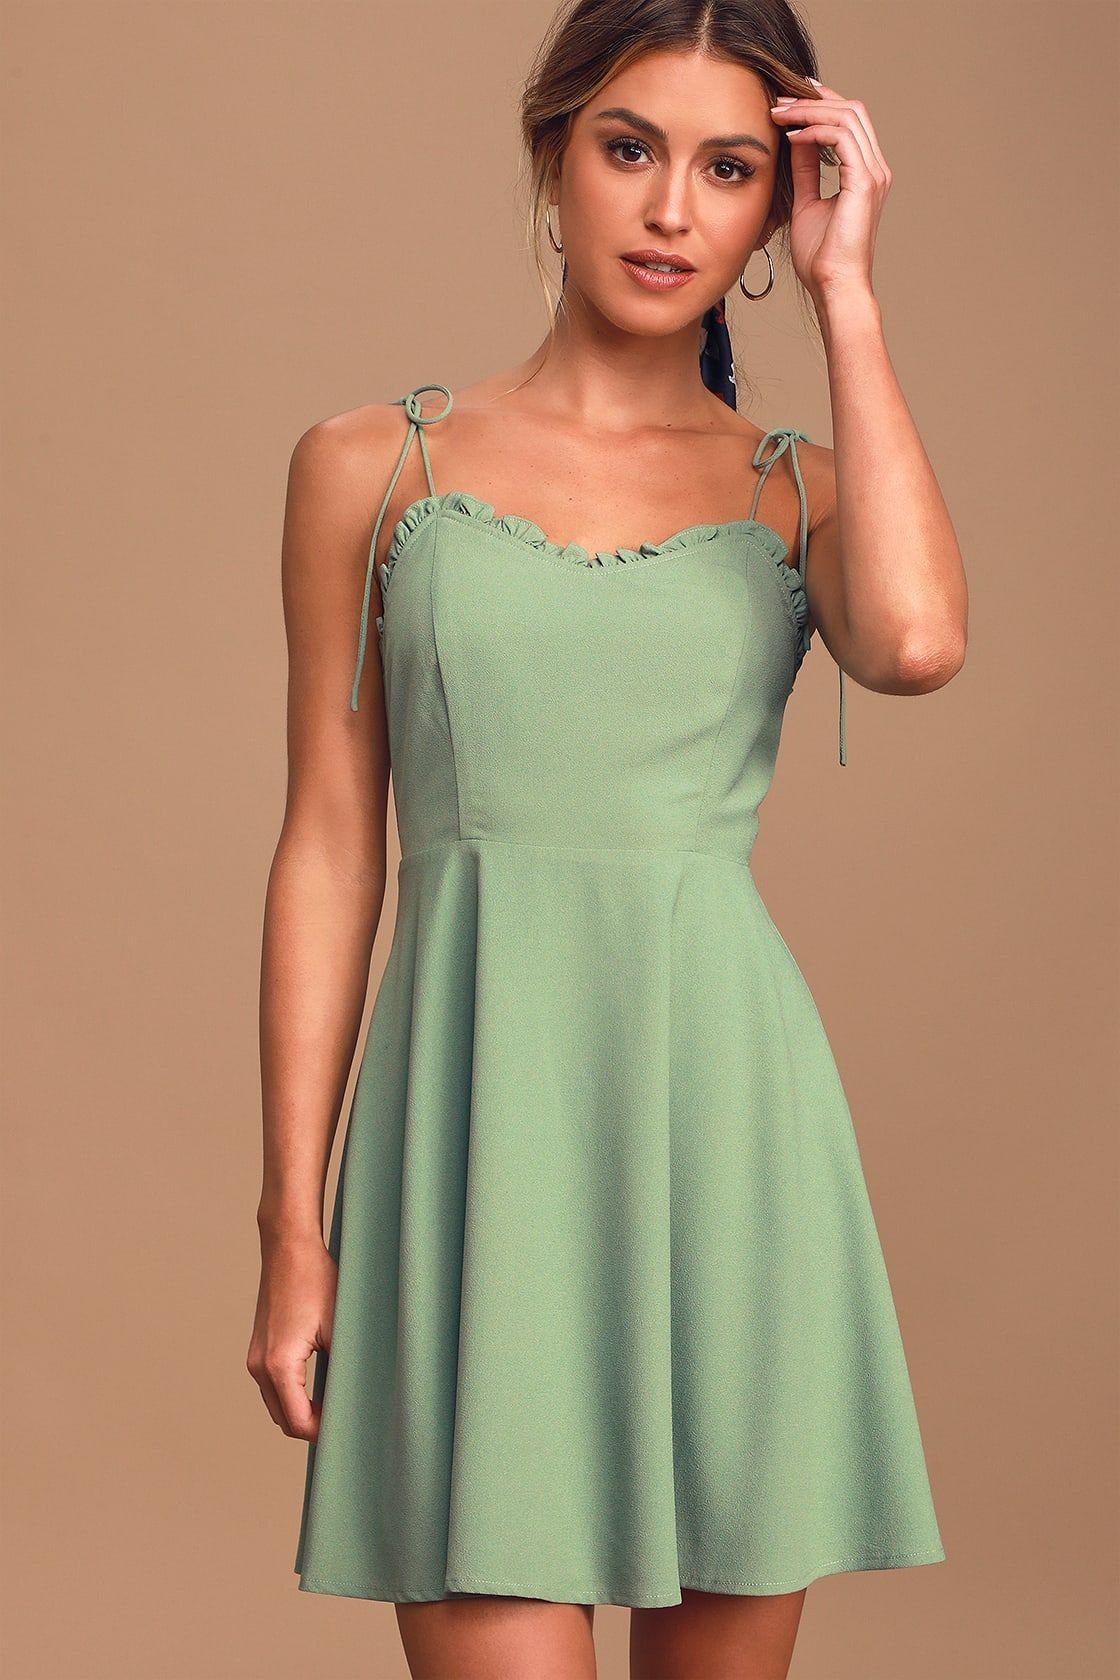 27++ Sage green dress info